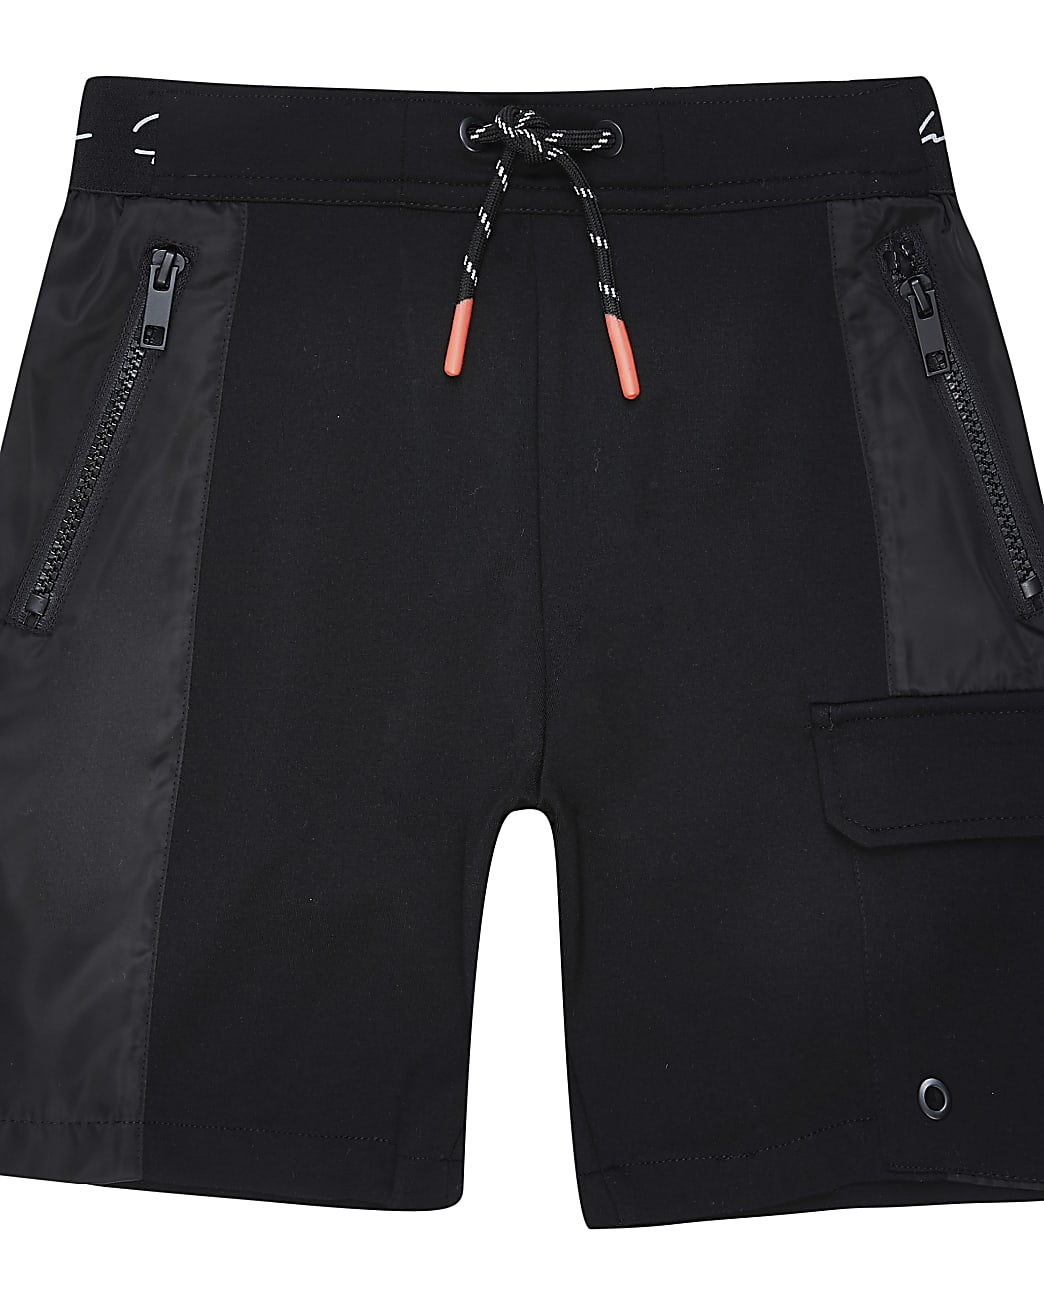 Boys black nylon jersey blocked short